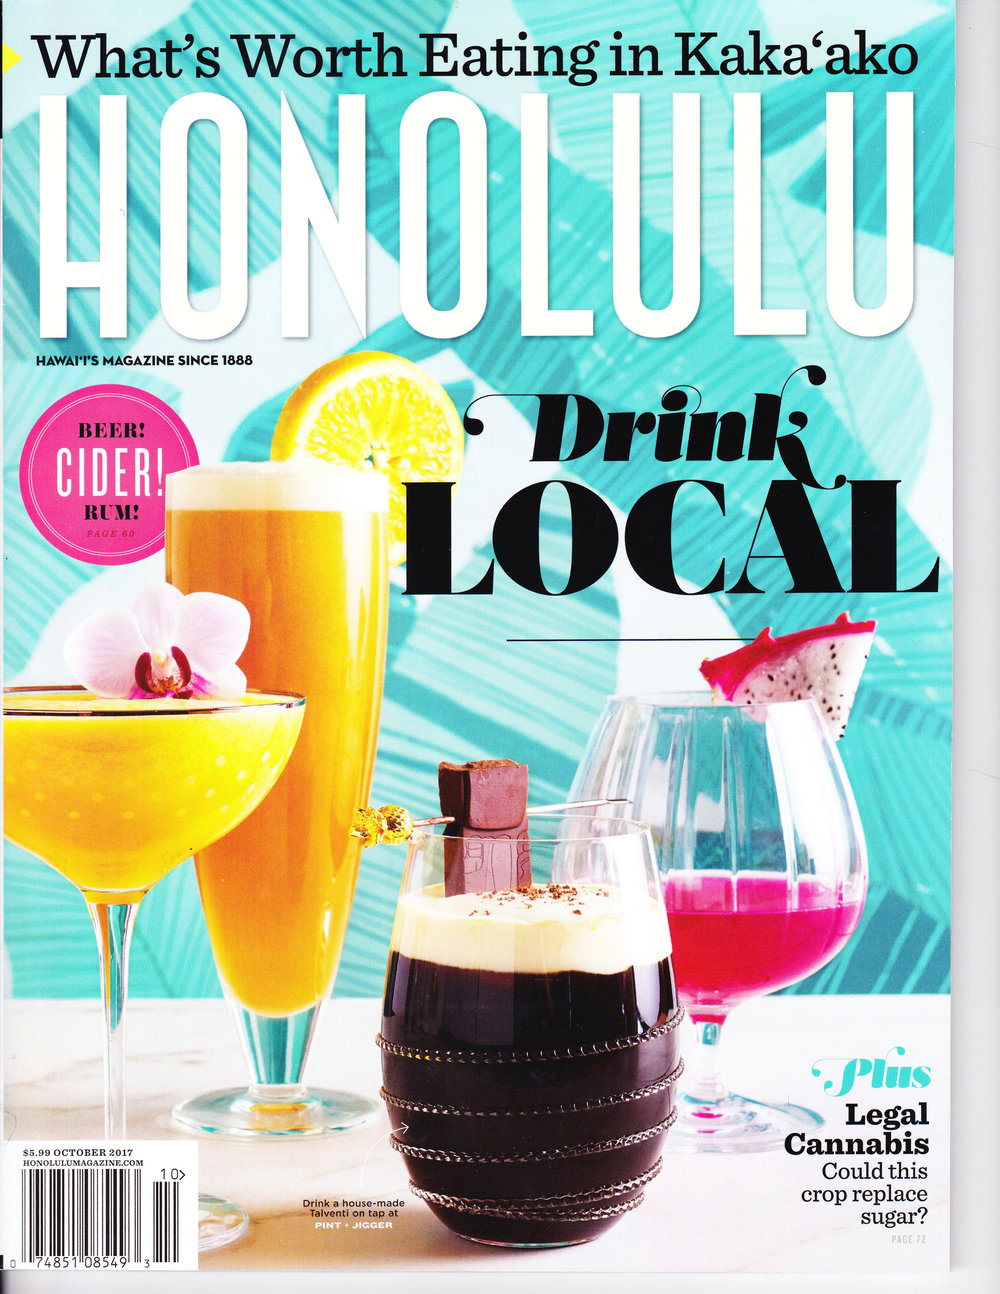 HonoluluMag_Cover.jpg